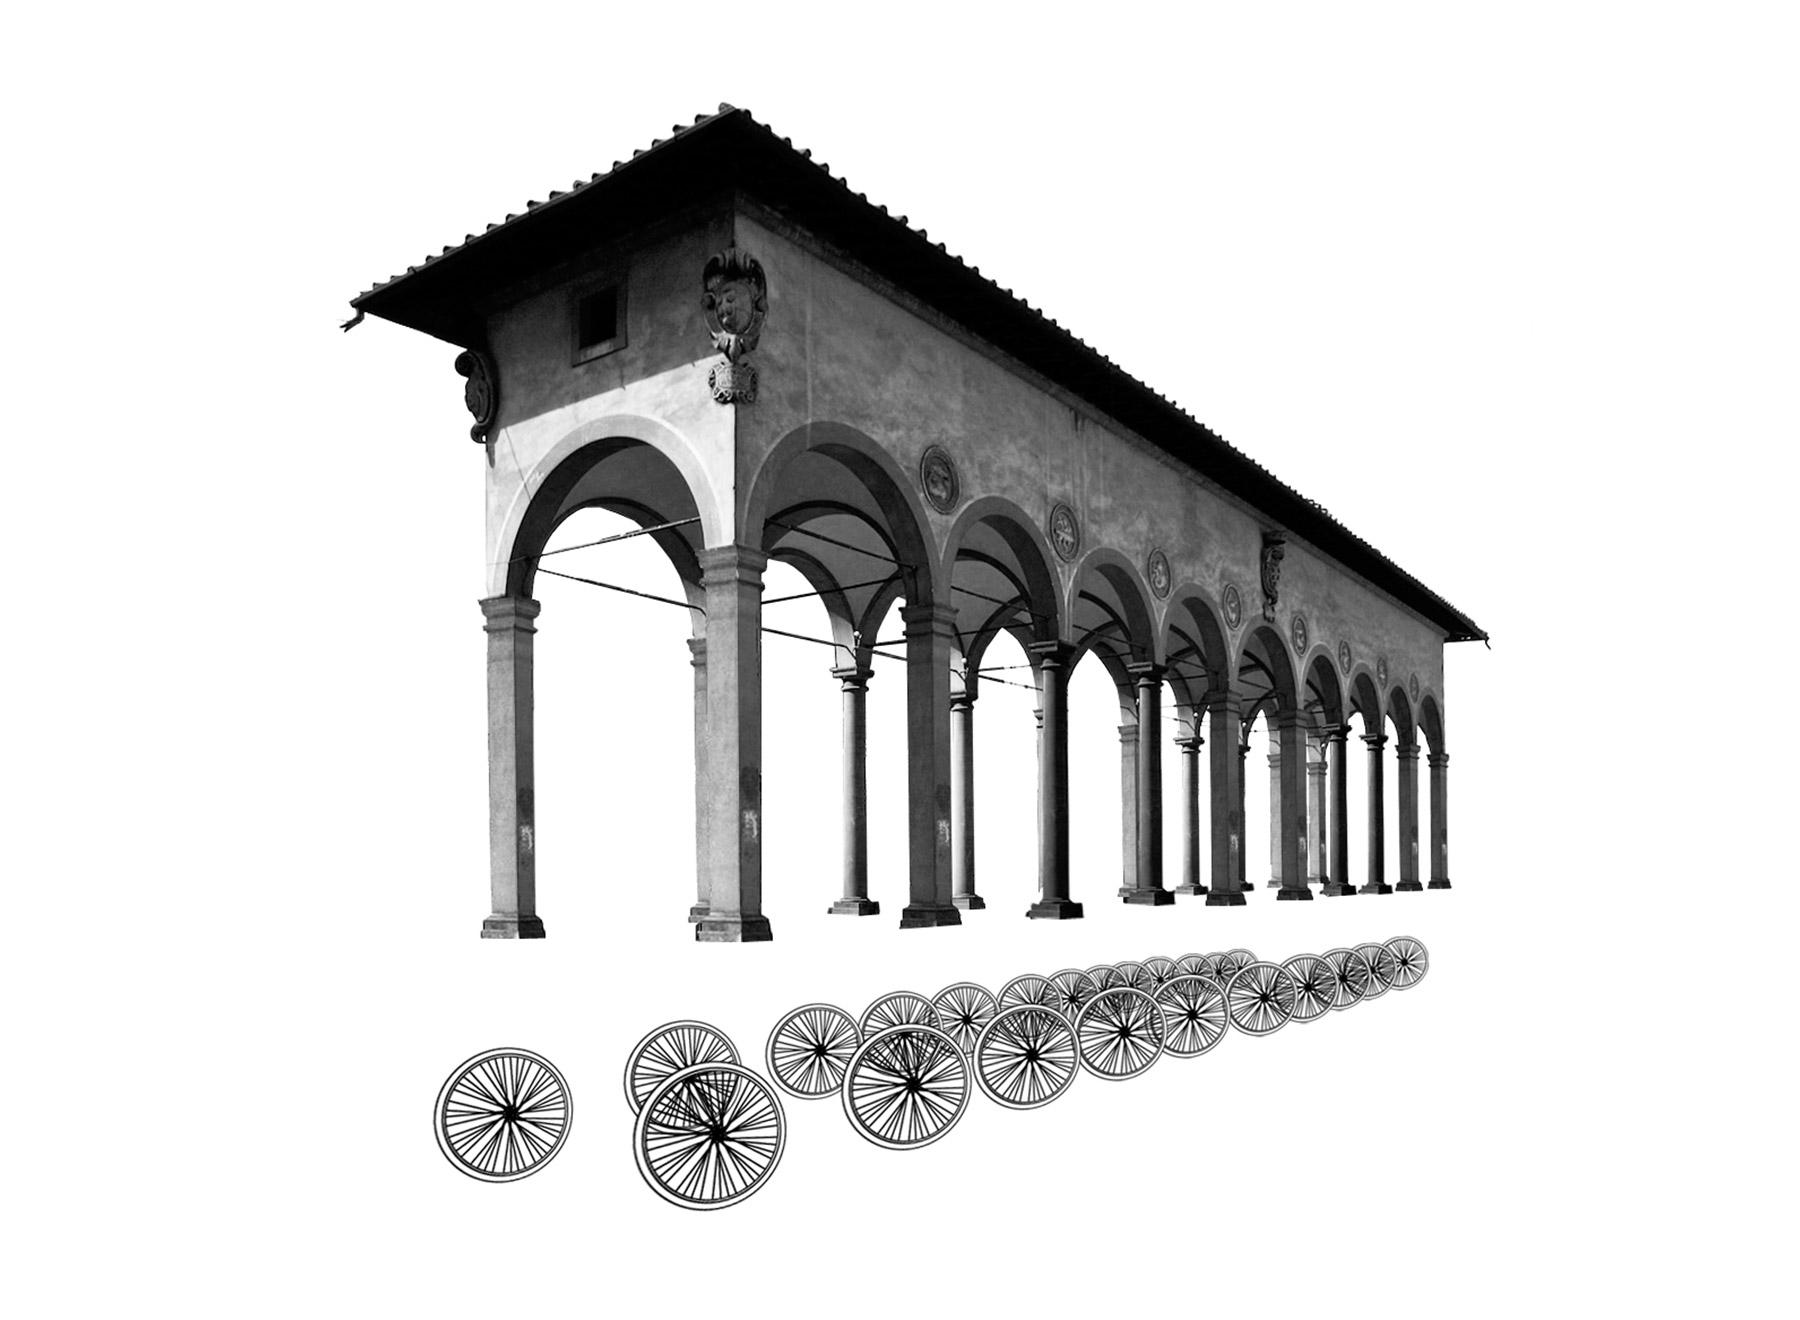 Loggia del Pesce, Giorgio Vasari, 1567 plus wheels